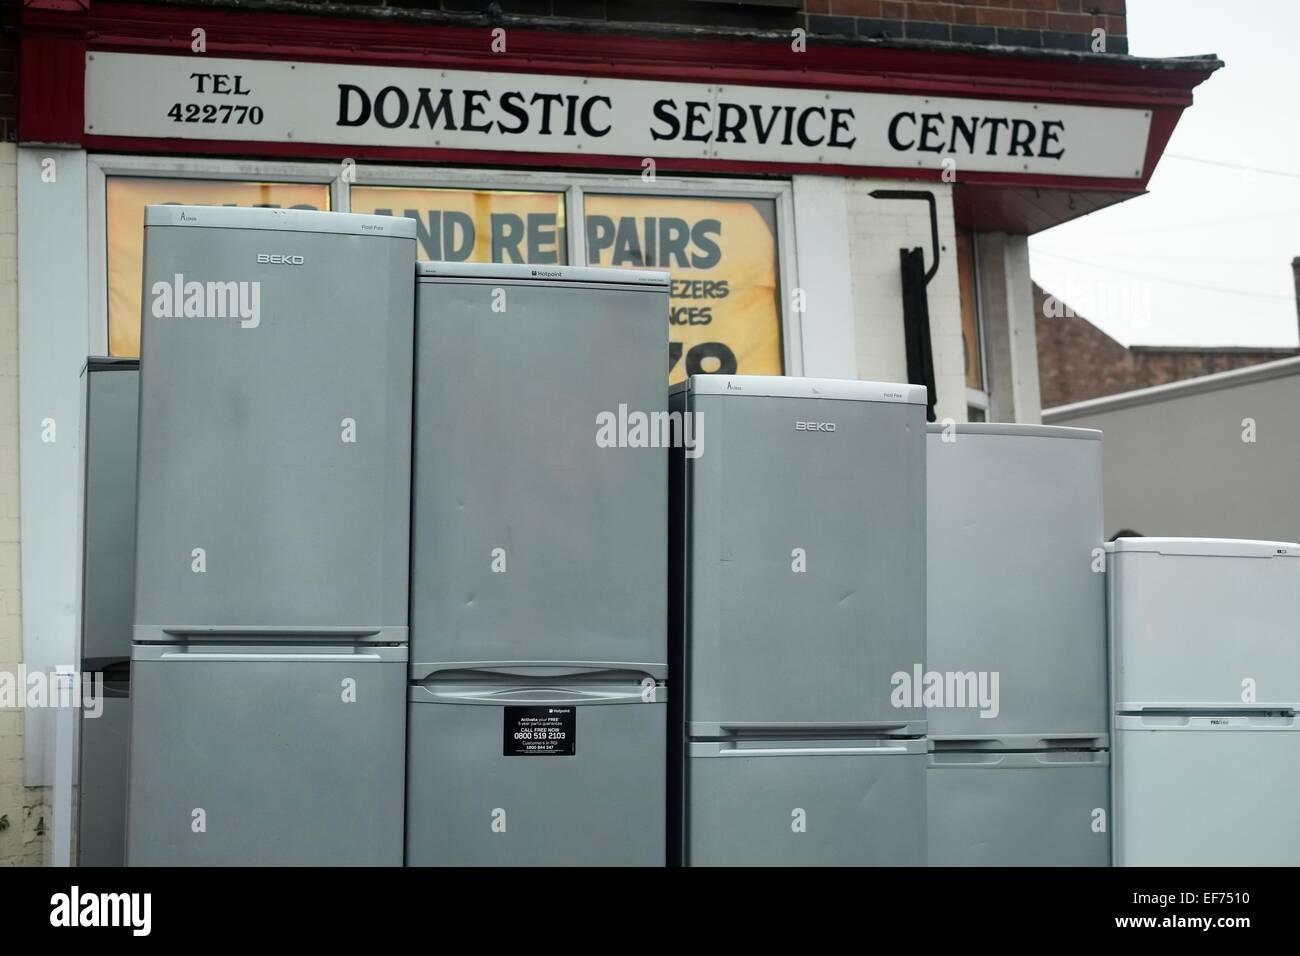 2nd hand fridges freezers  being sold outside a shop Nottingham England UK - Stock Image